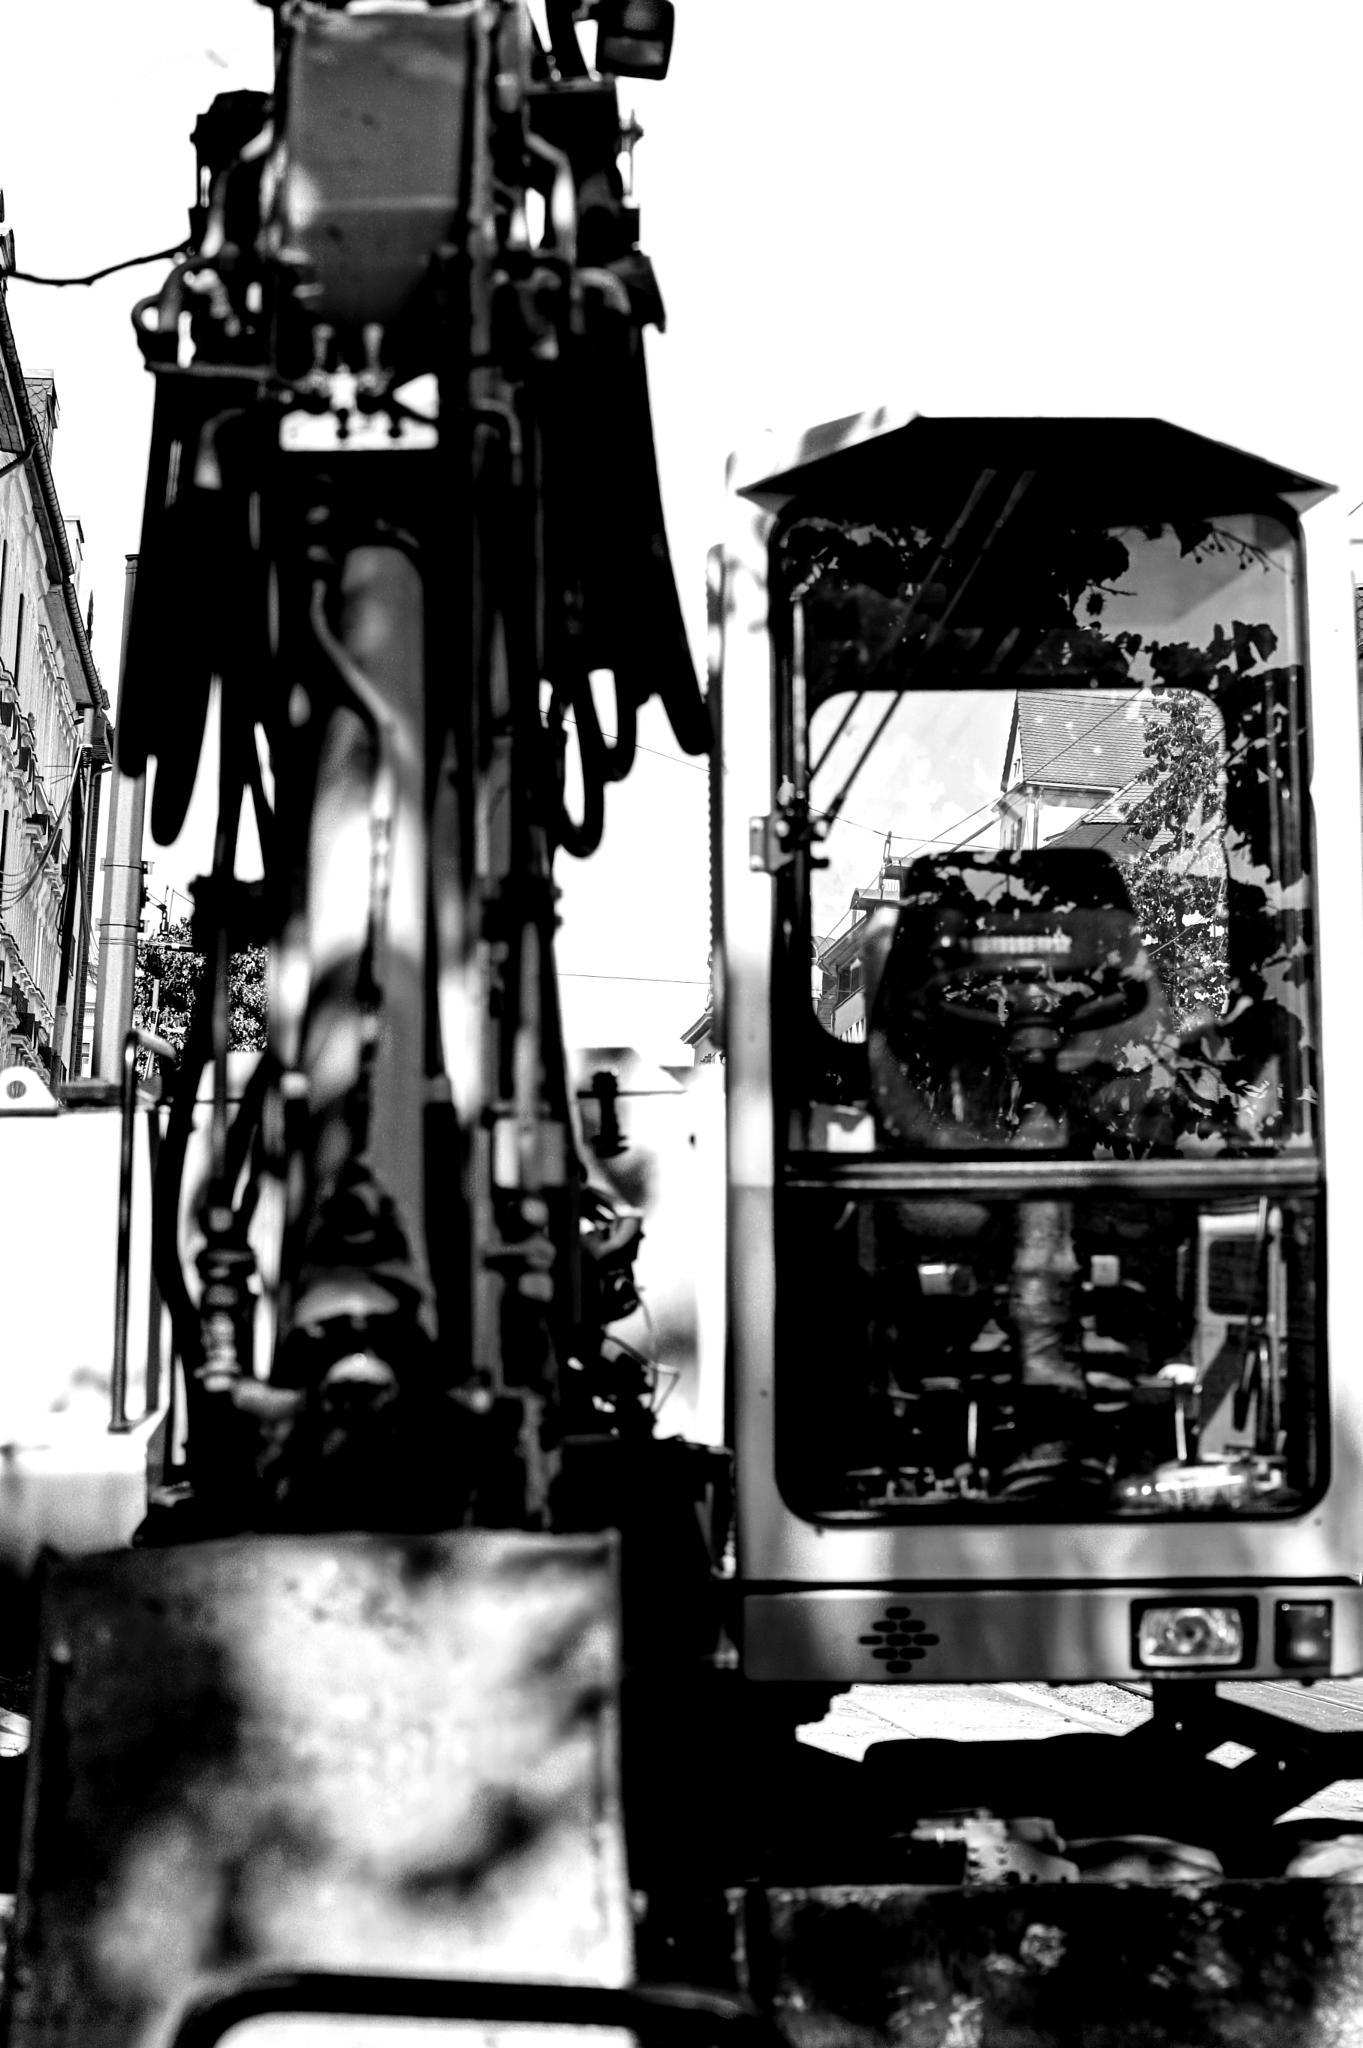 machine by Walter W. Price